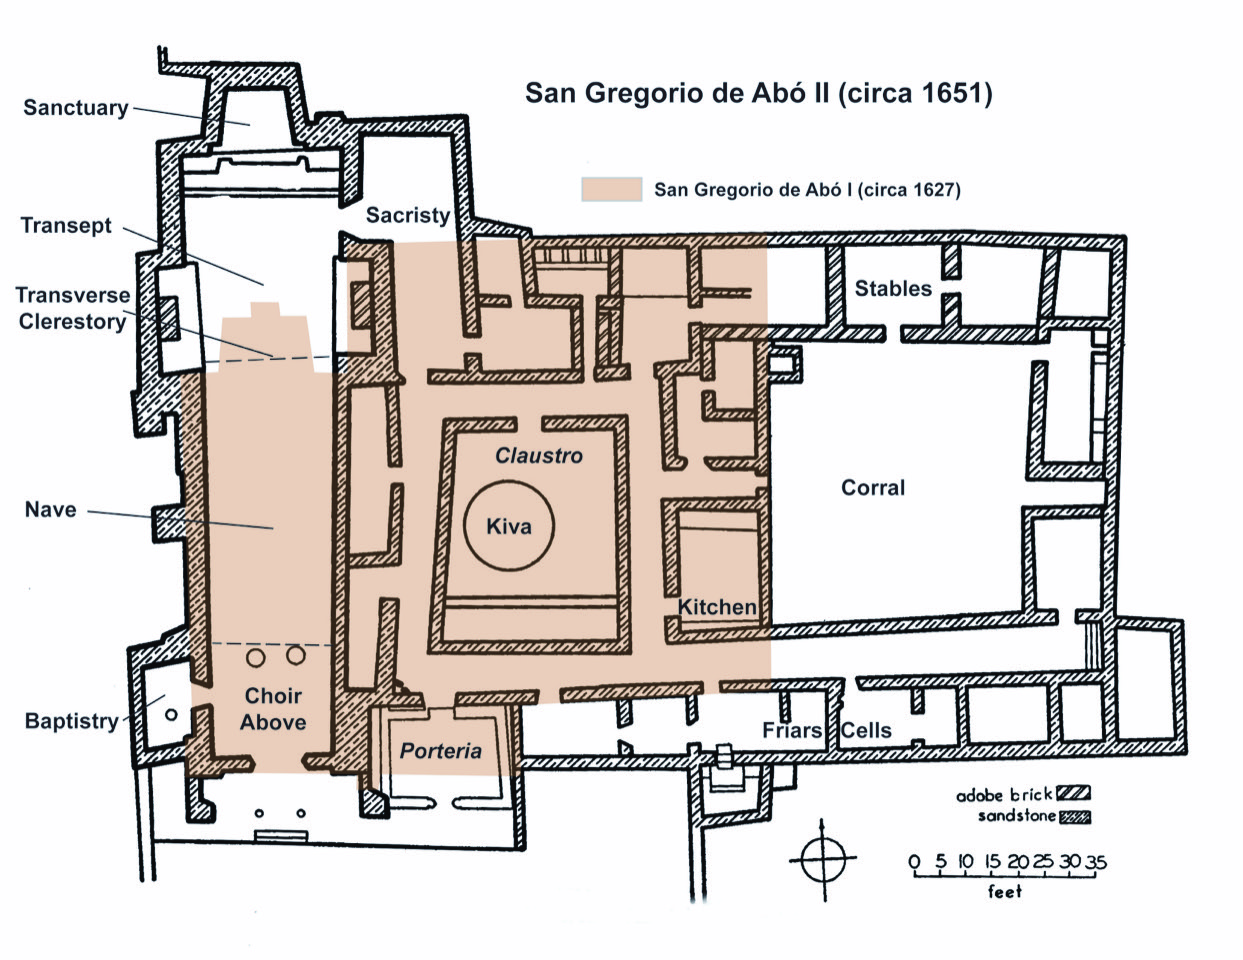 Abó #3 Plan with 2 churches